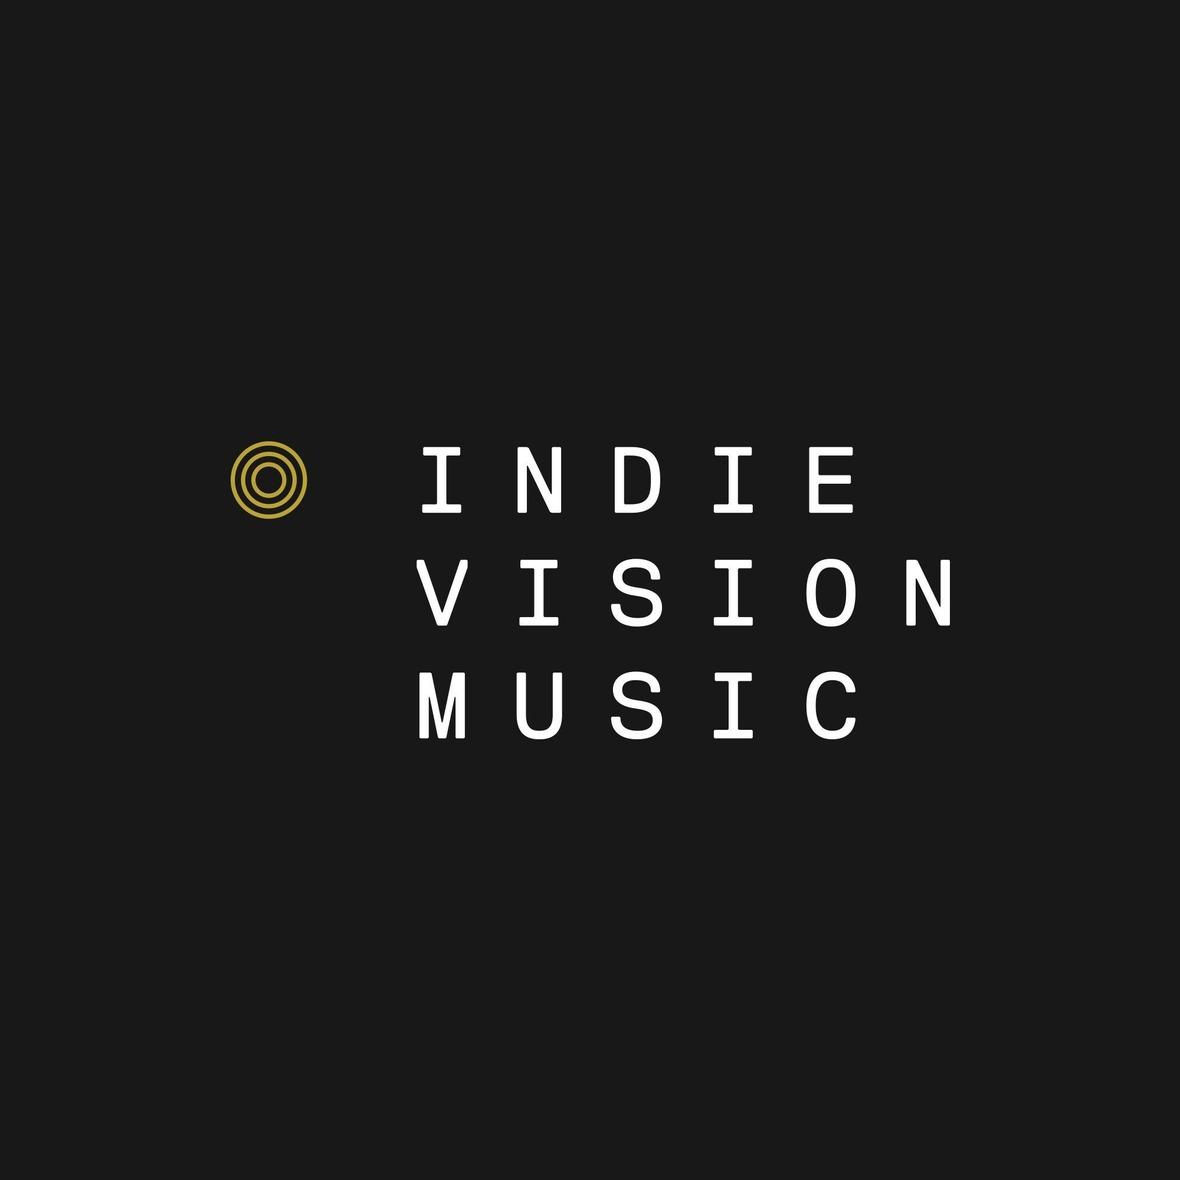 indie vision music logo